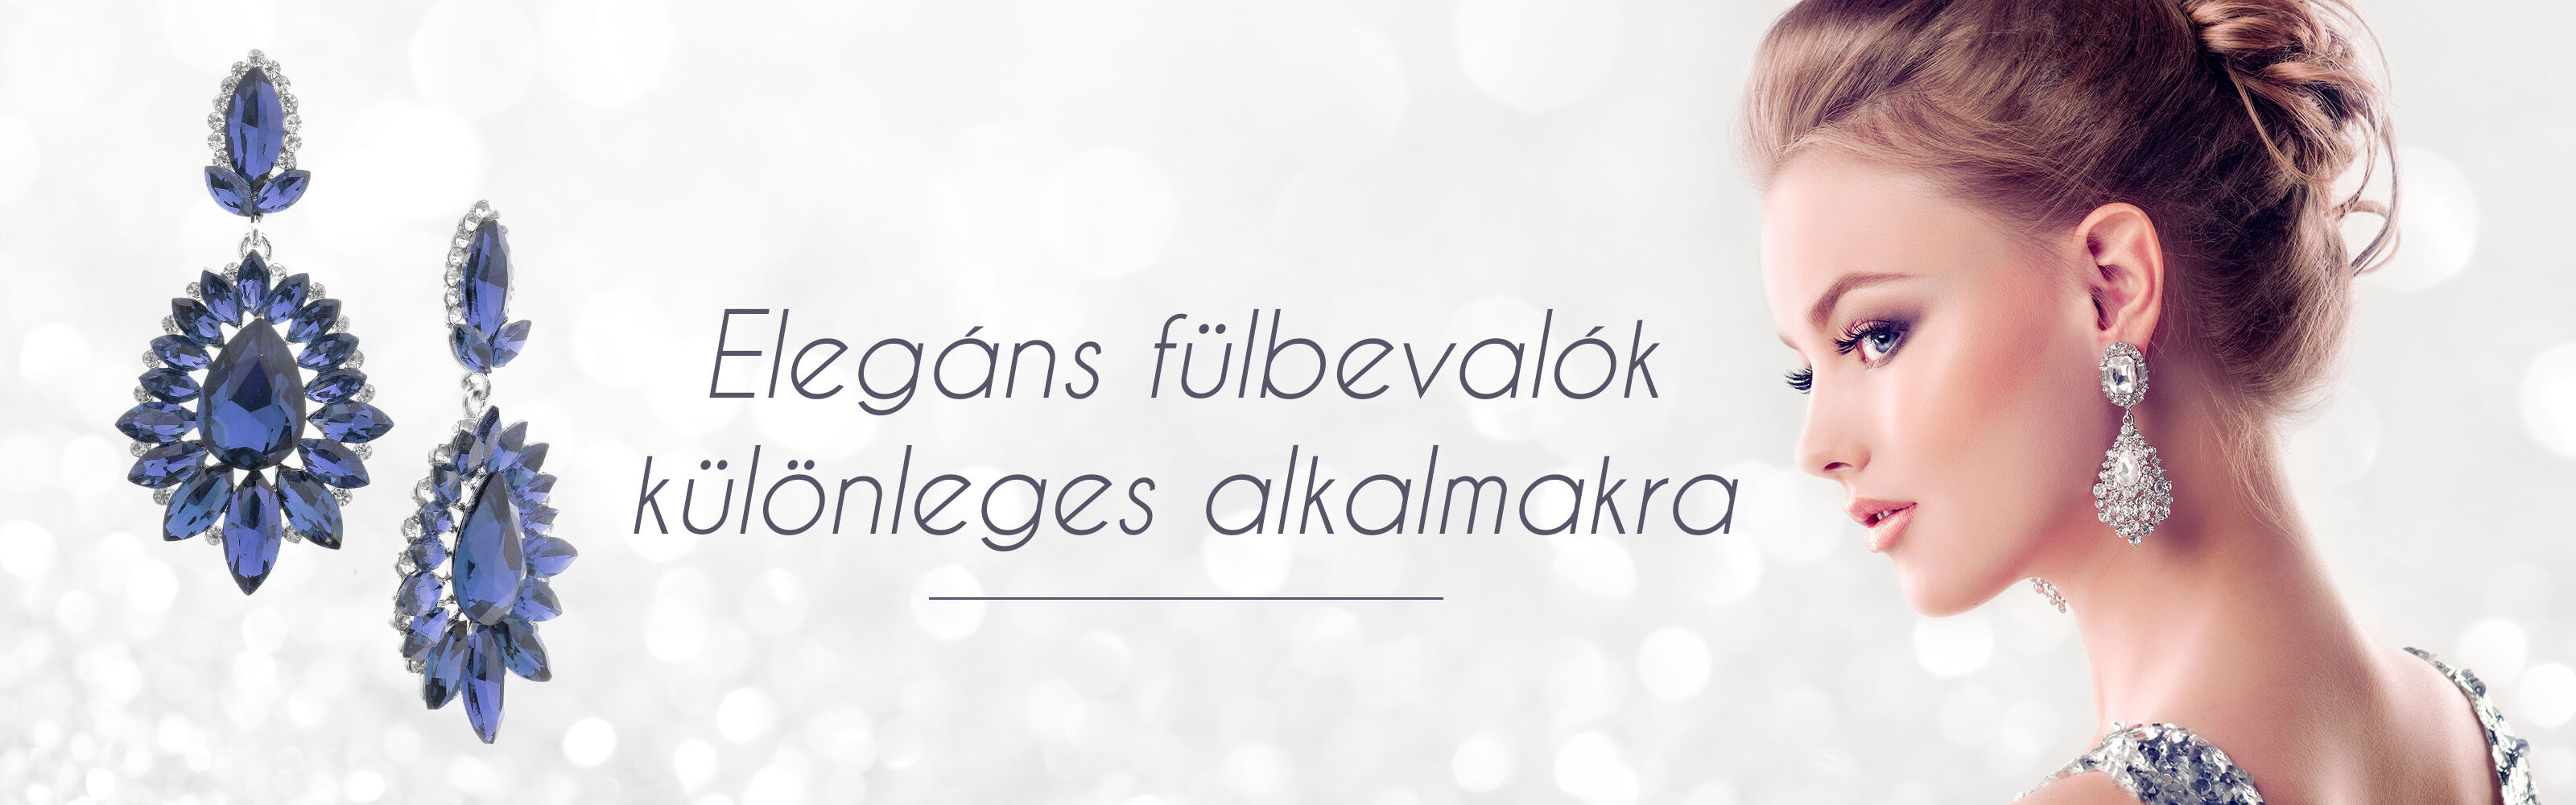 fulbevalo1920x600_banner